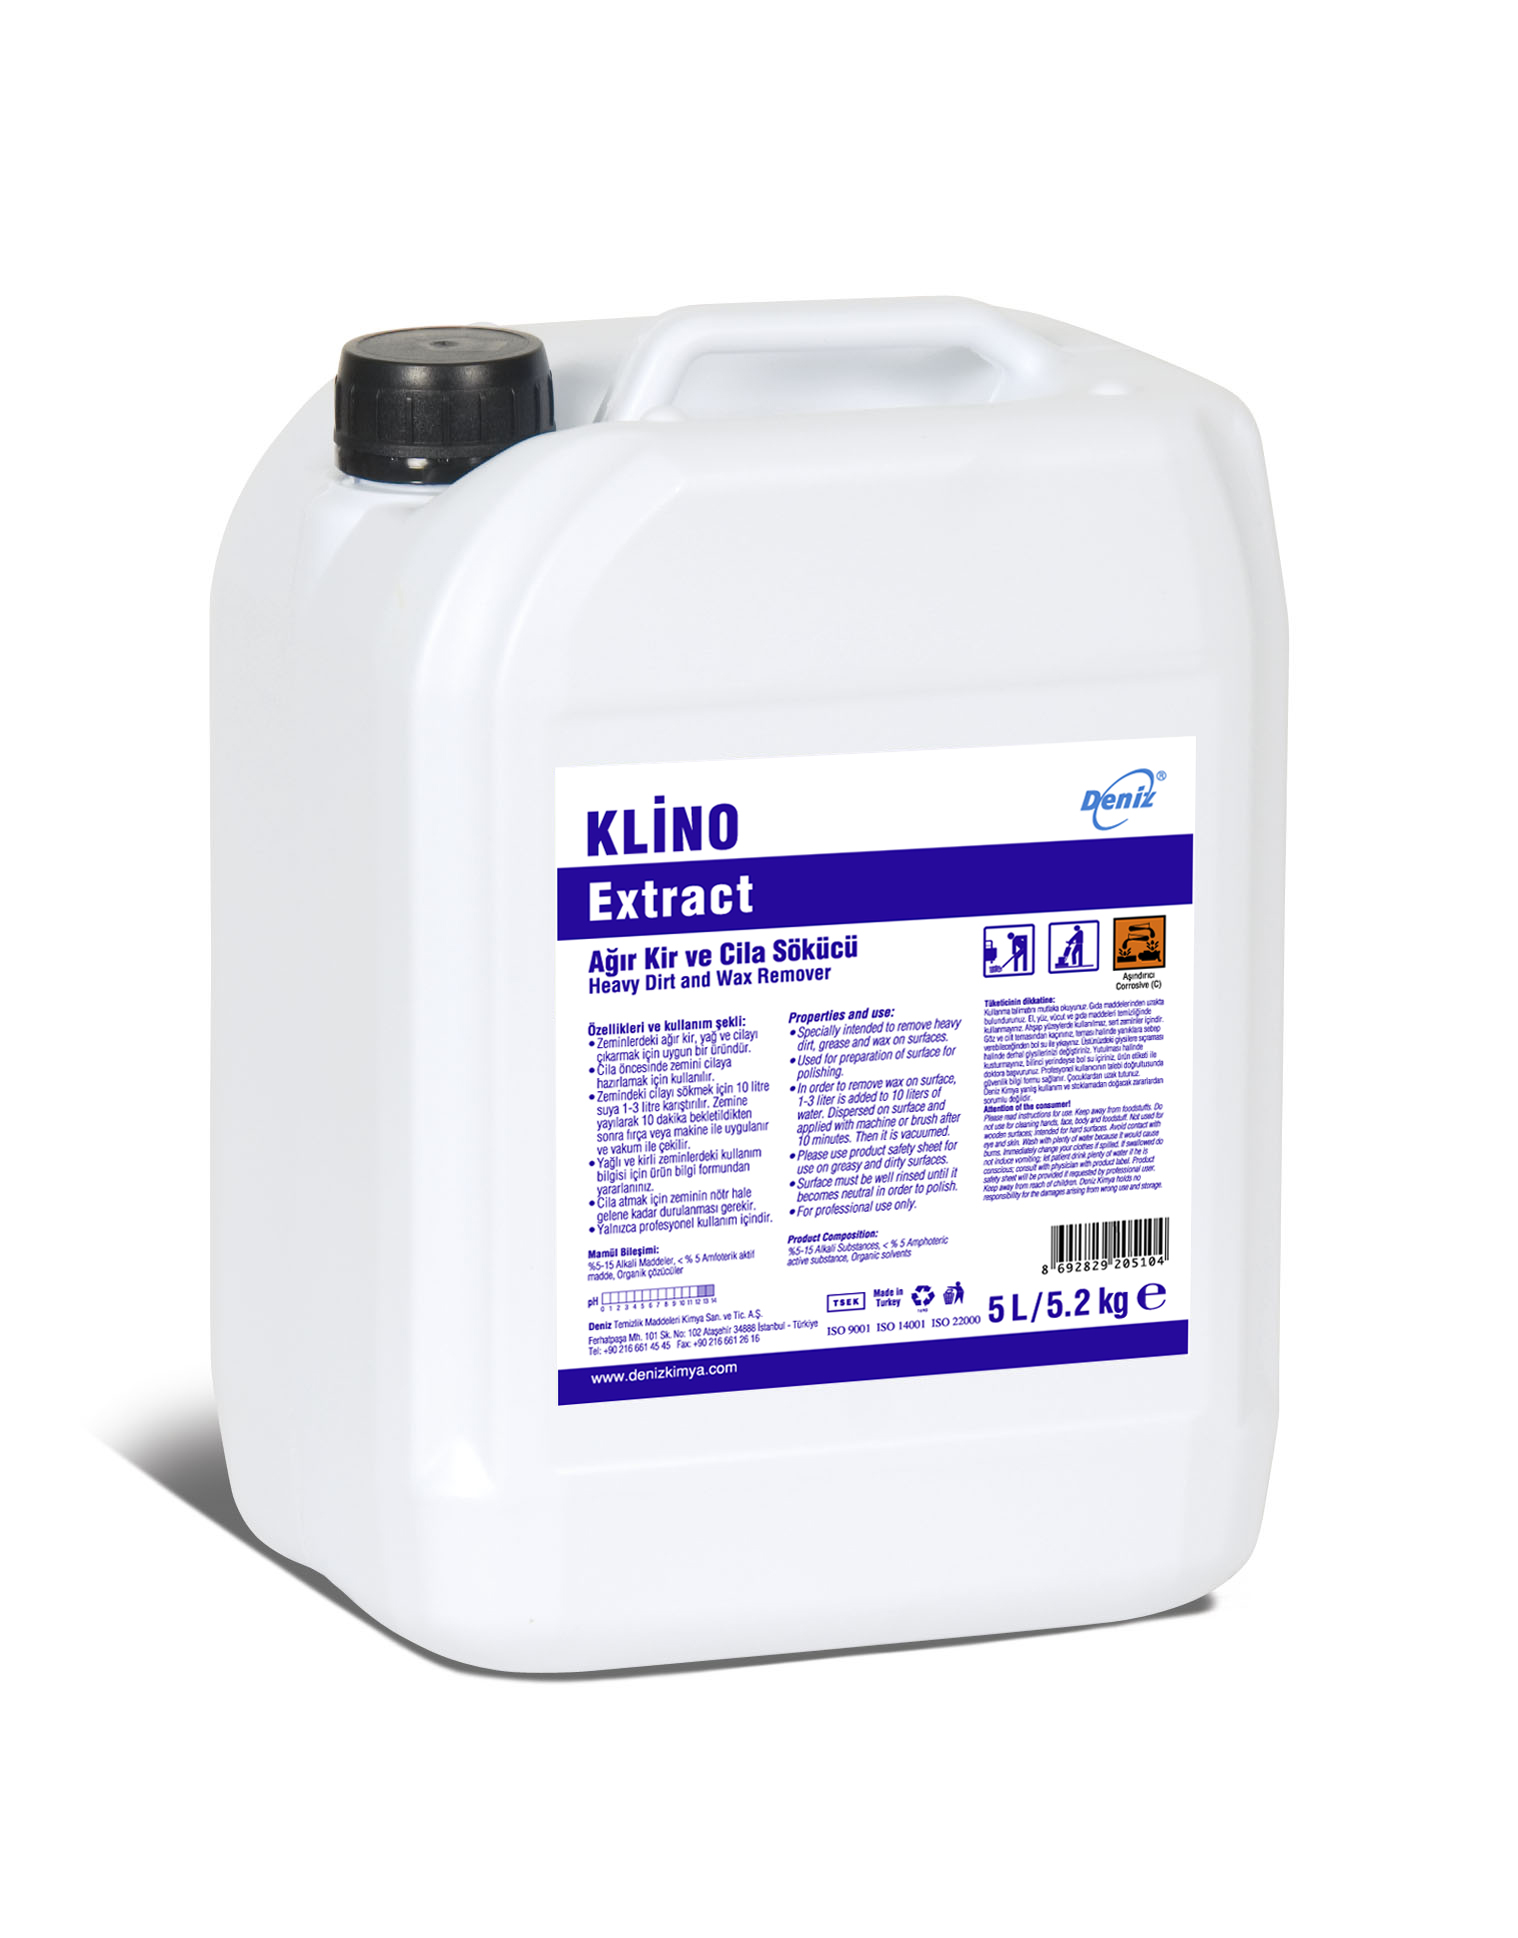 Klino Extract